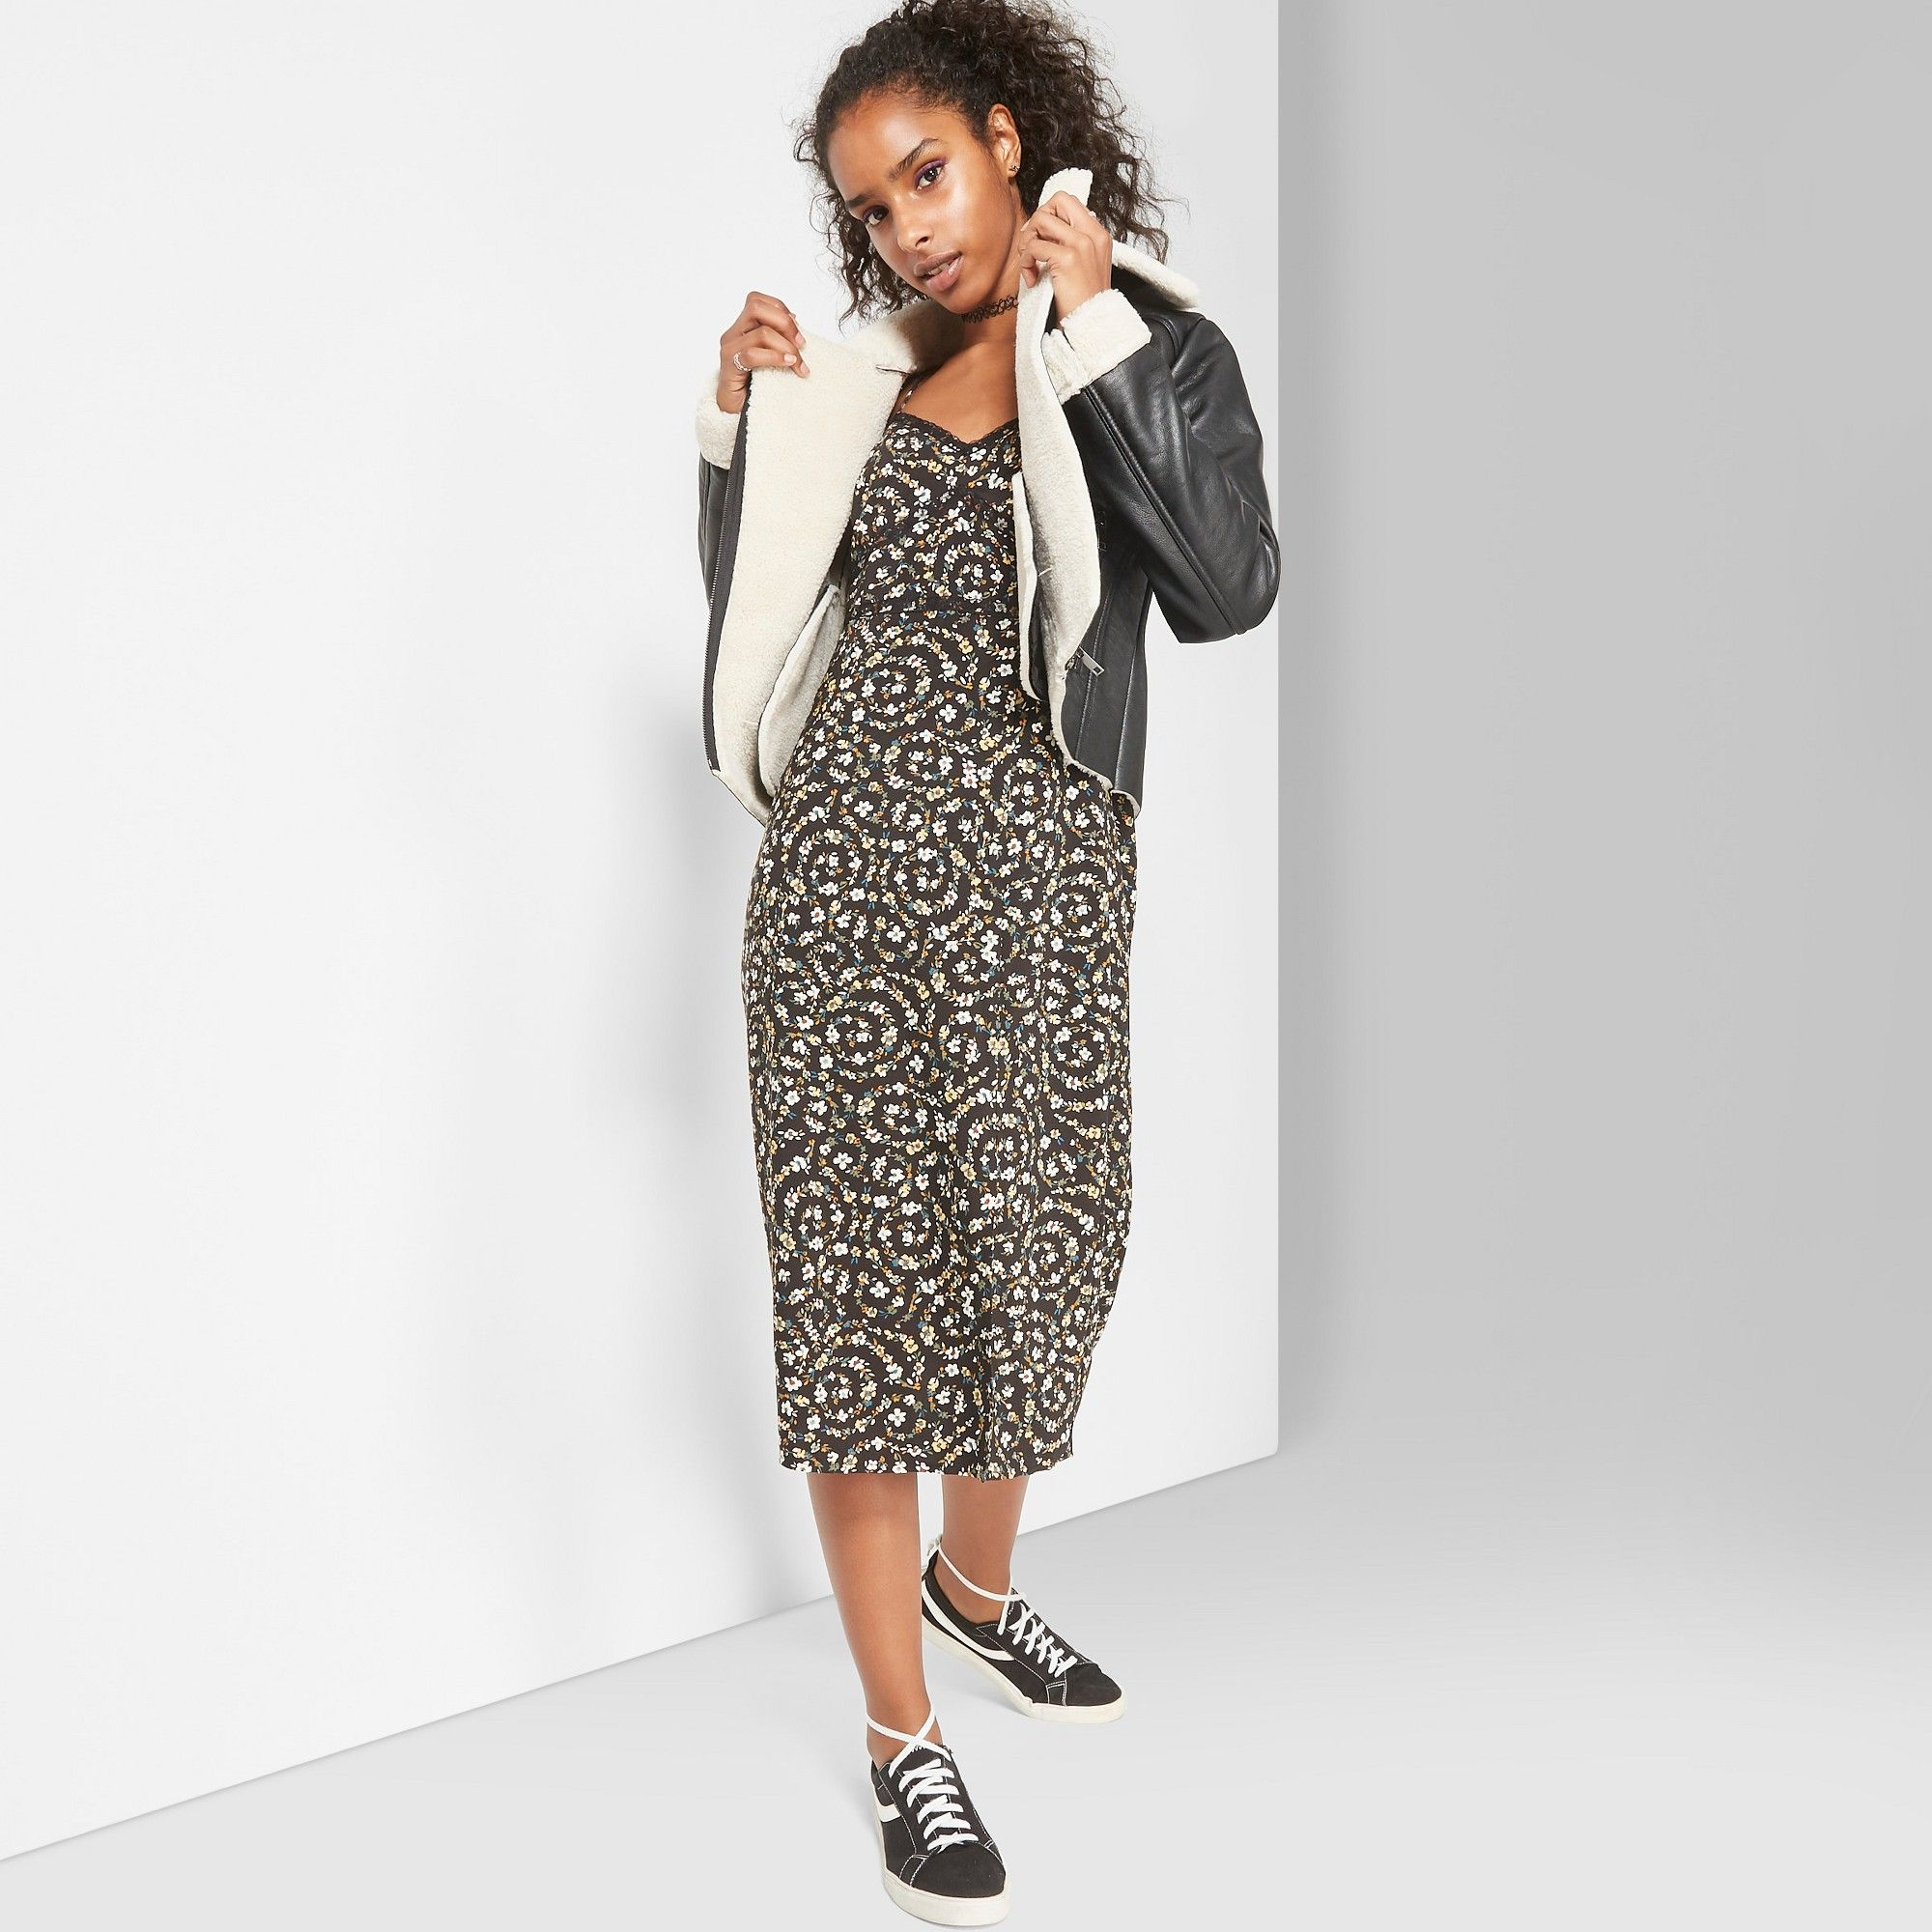 ec92527cd07a Women's Floral Print Lace Trim Strappy Slip Midi Dress - Wild Fable Black  Xxl